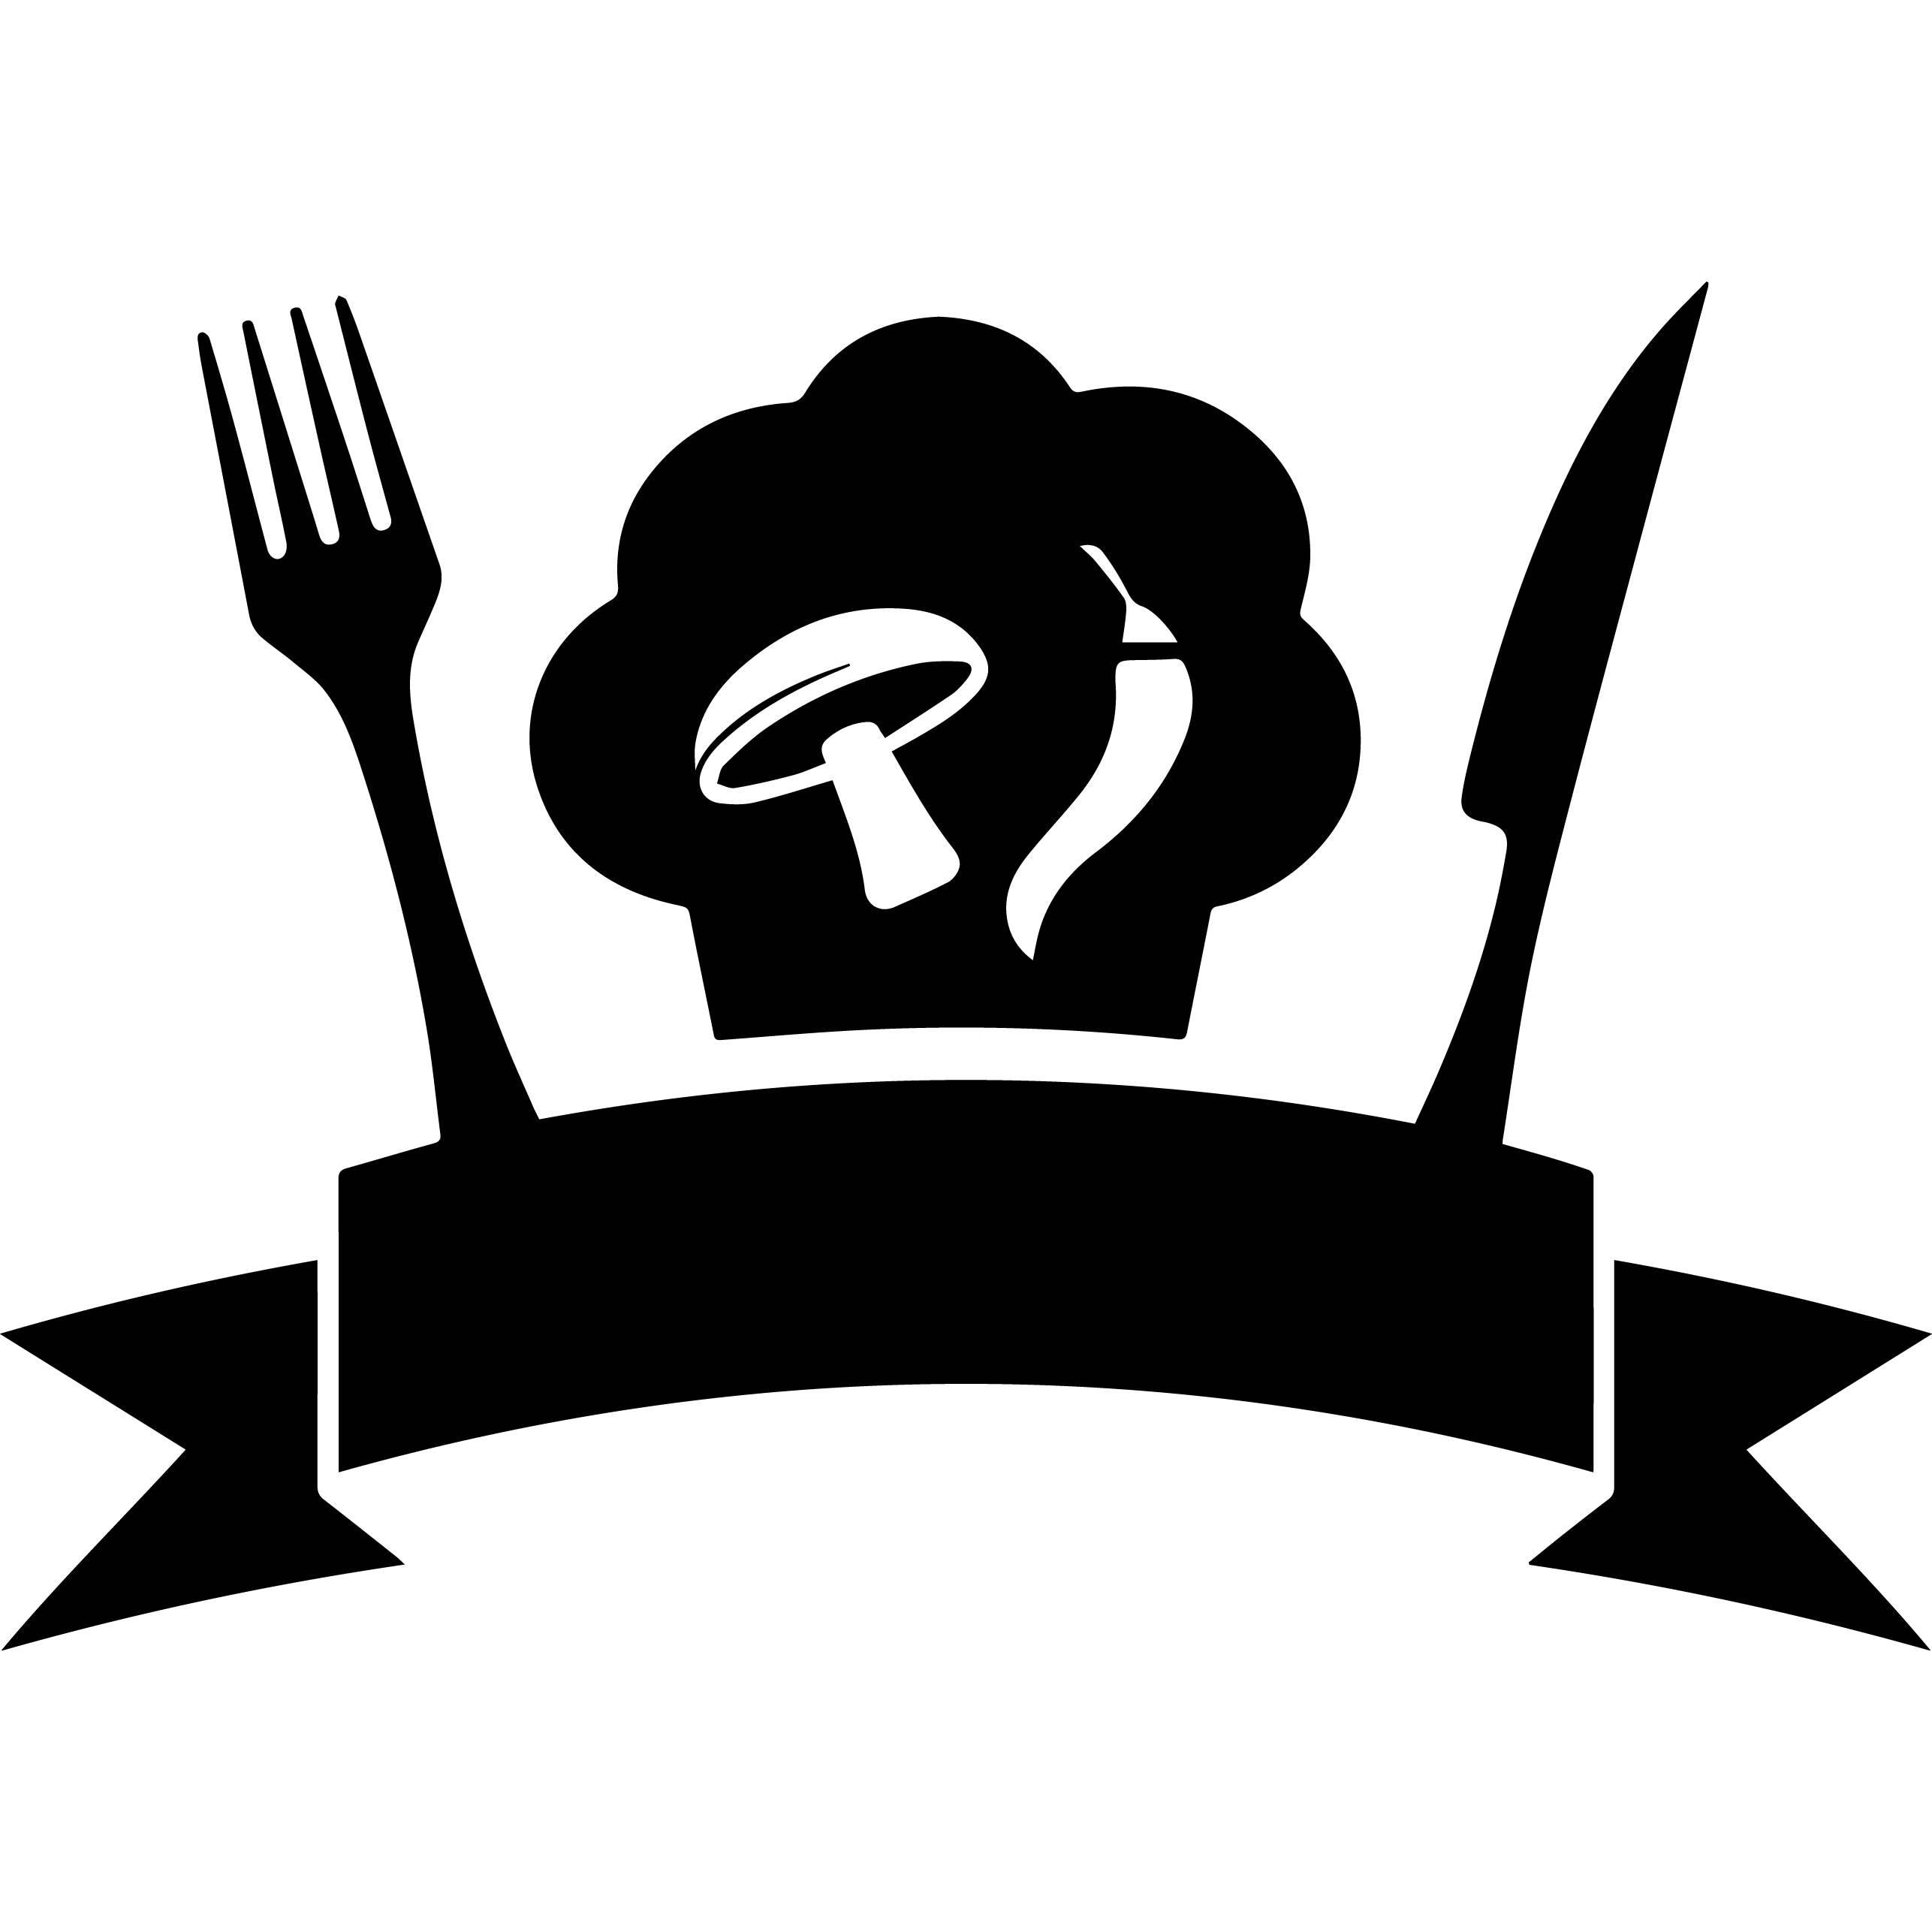 kitchen chef logo business restaurant cafeteria food clip art kitten pictures clip art kitchen items